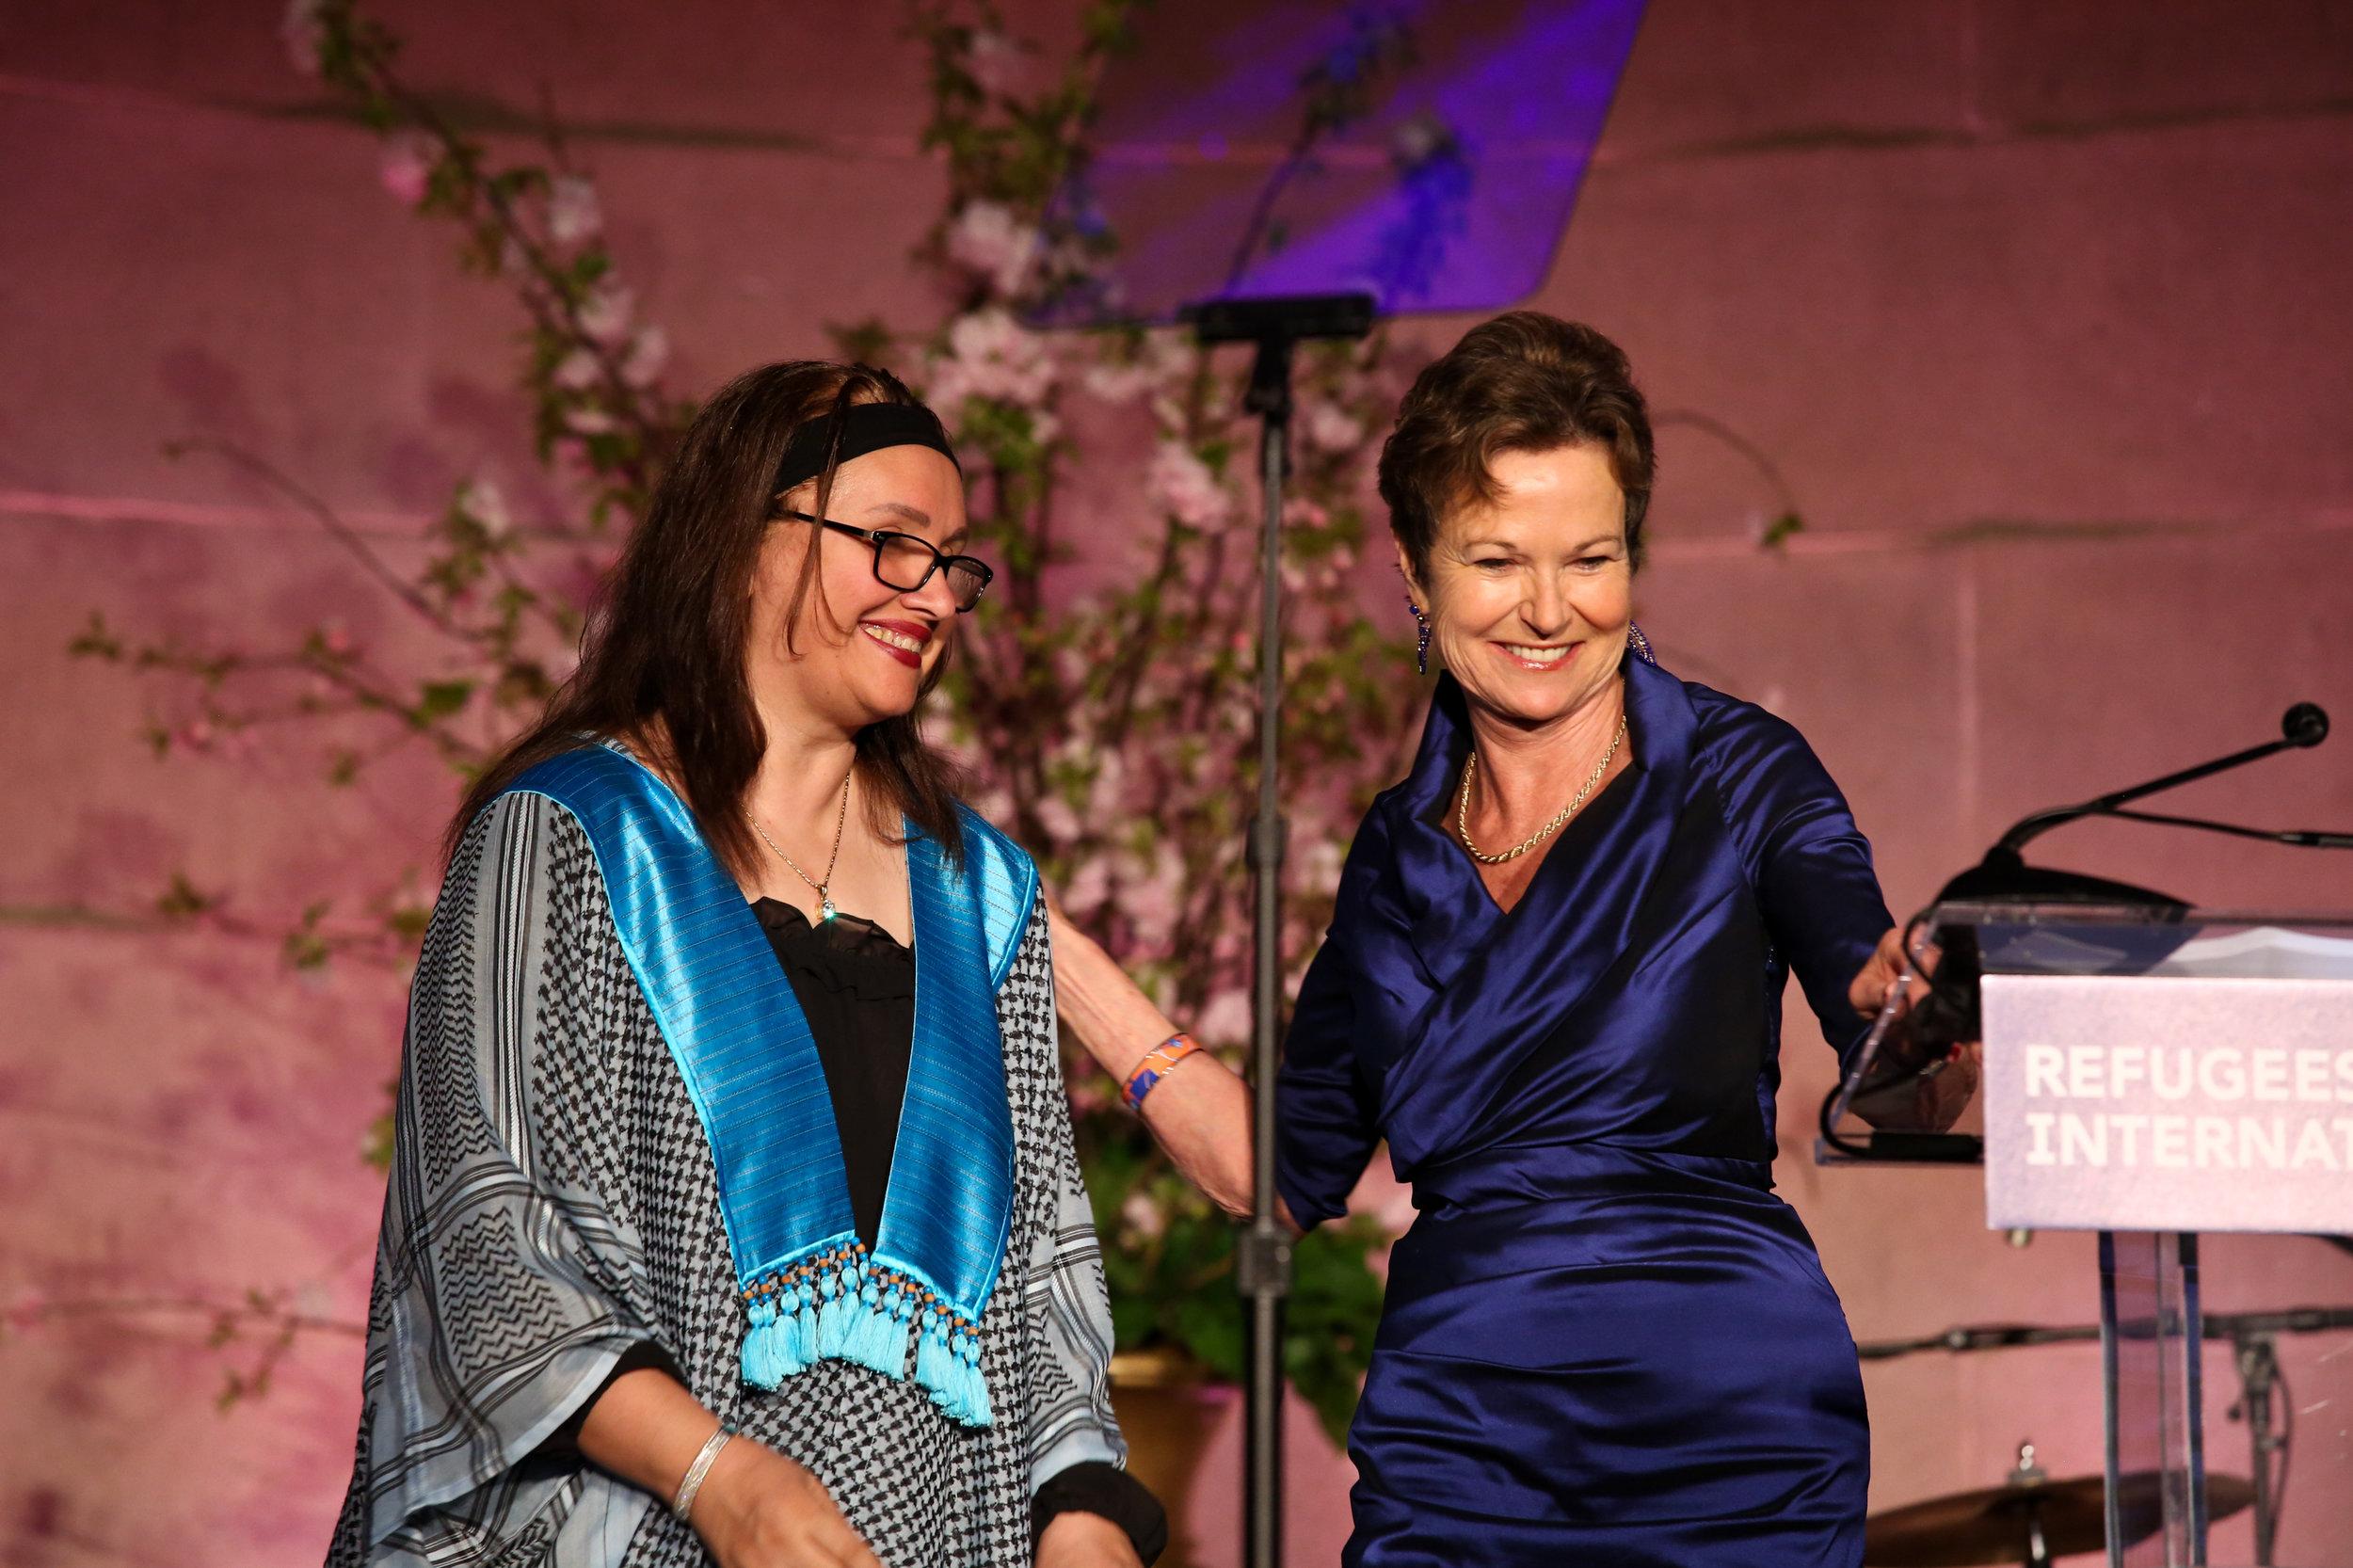 Kati Marton presents the 2018 Richard C. Holbrooke Award to Hala al-Sarraf of the Iraq Health Access Organization.